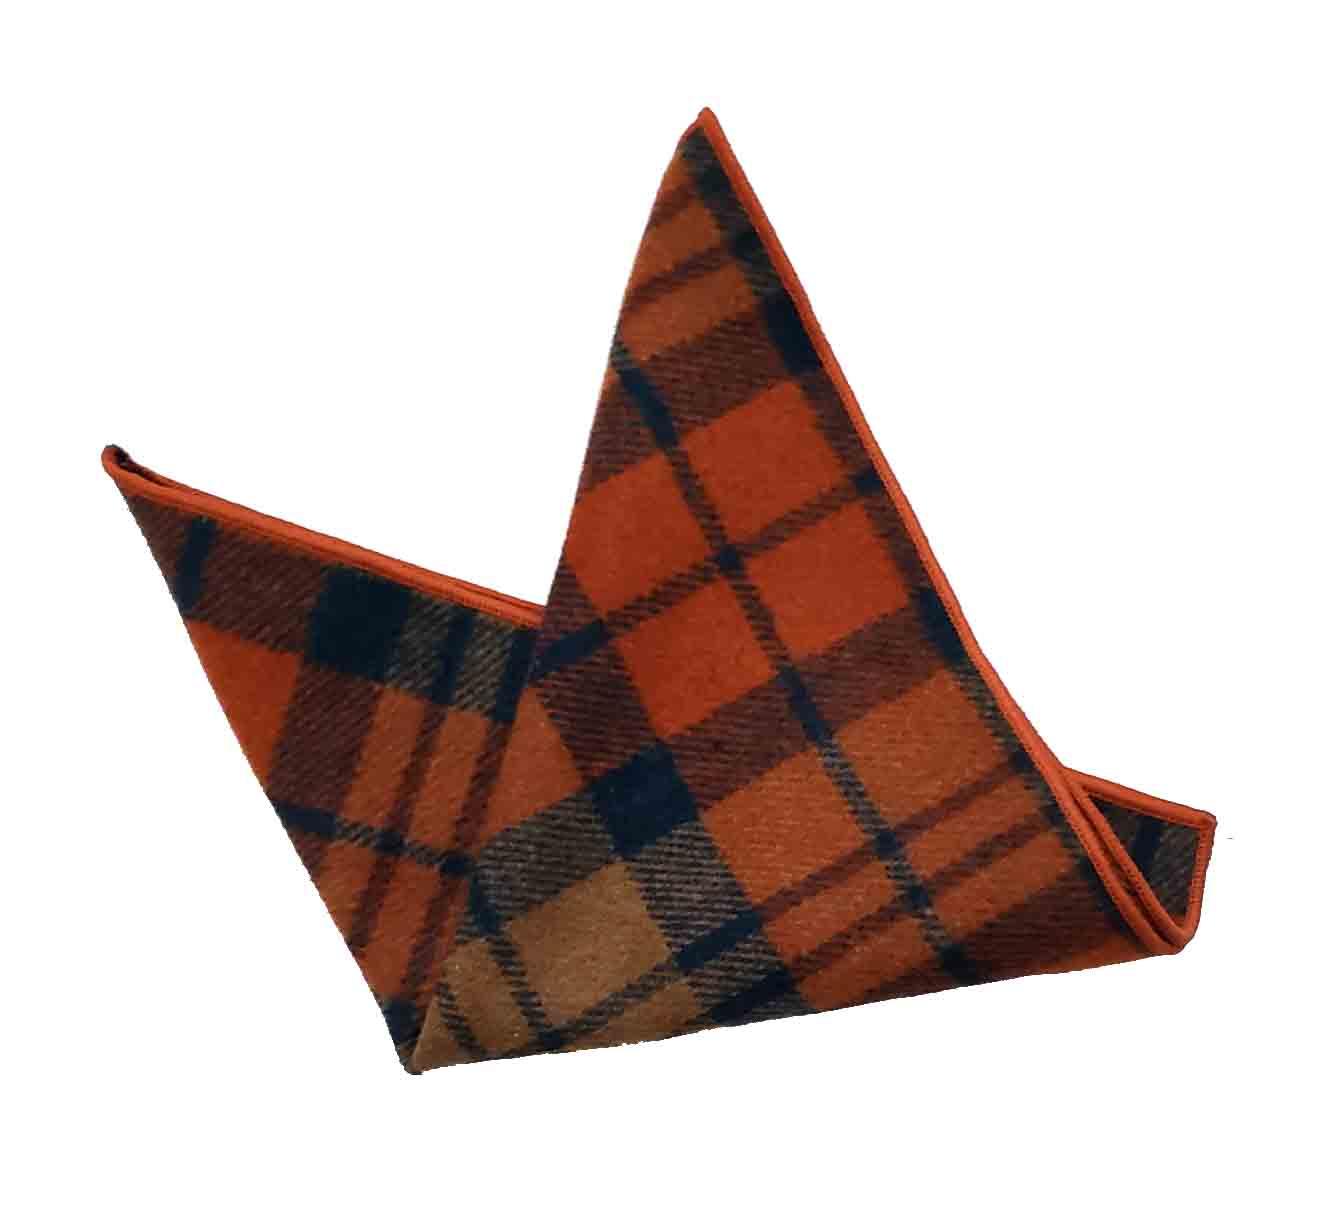 Gascoigne Pocket Square Wool Blend Plaid Orange Brown Black Men's